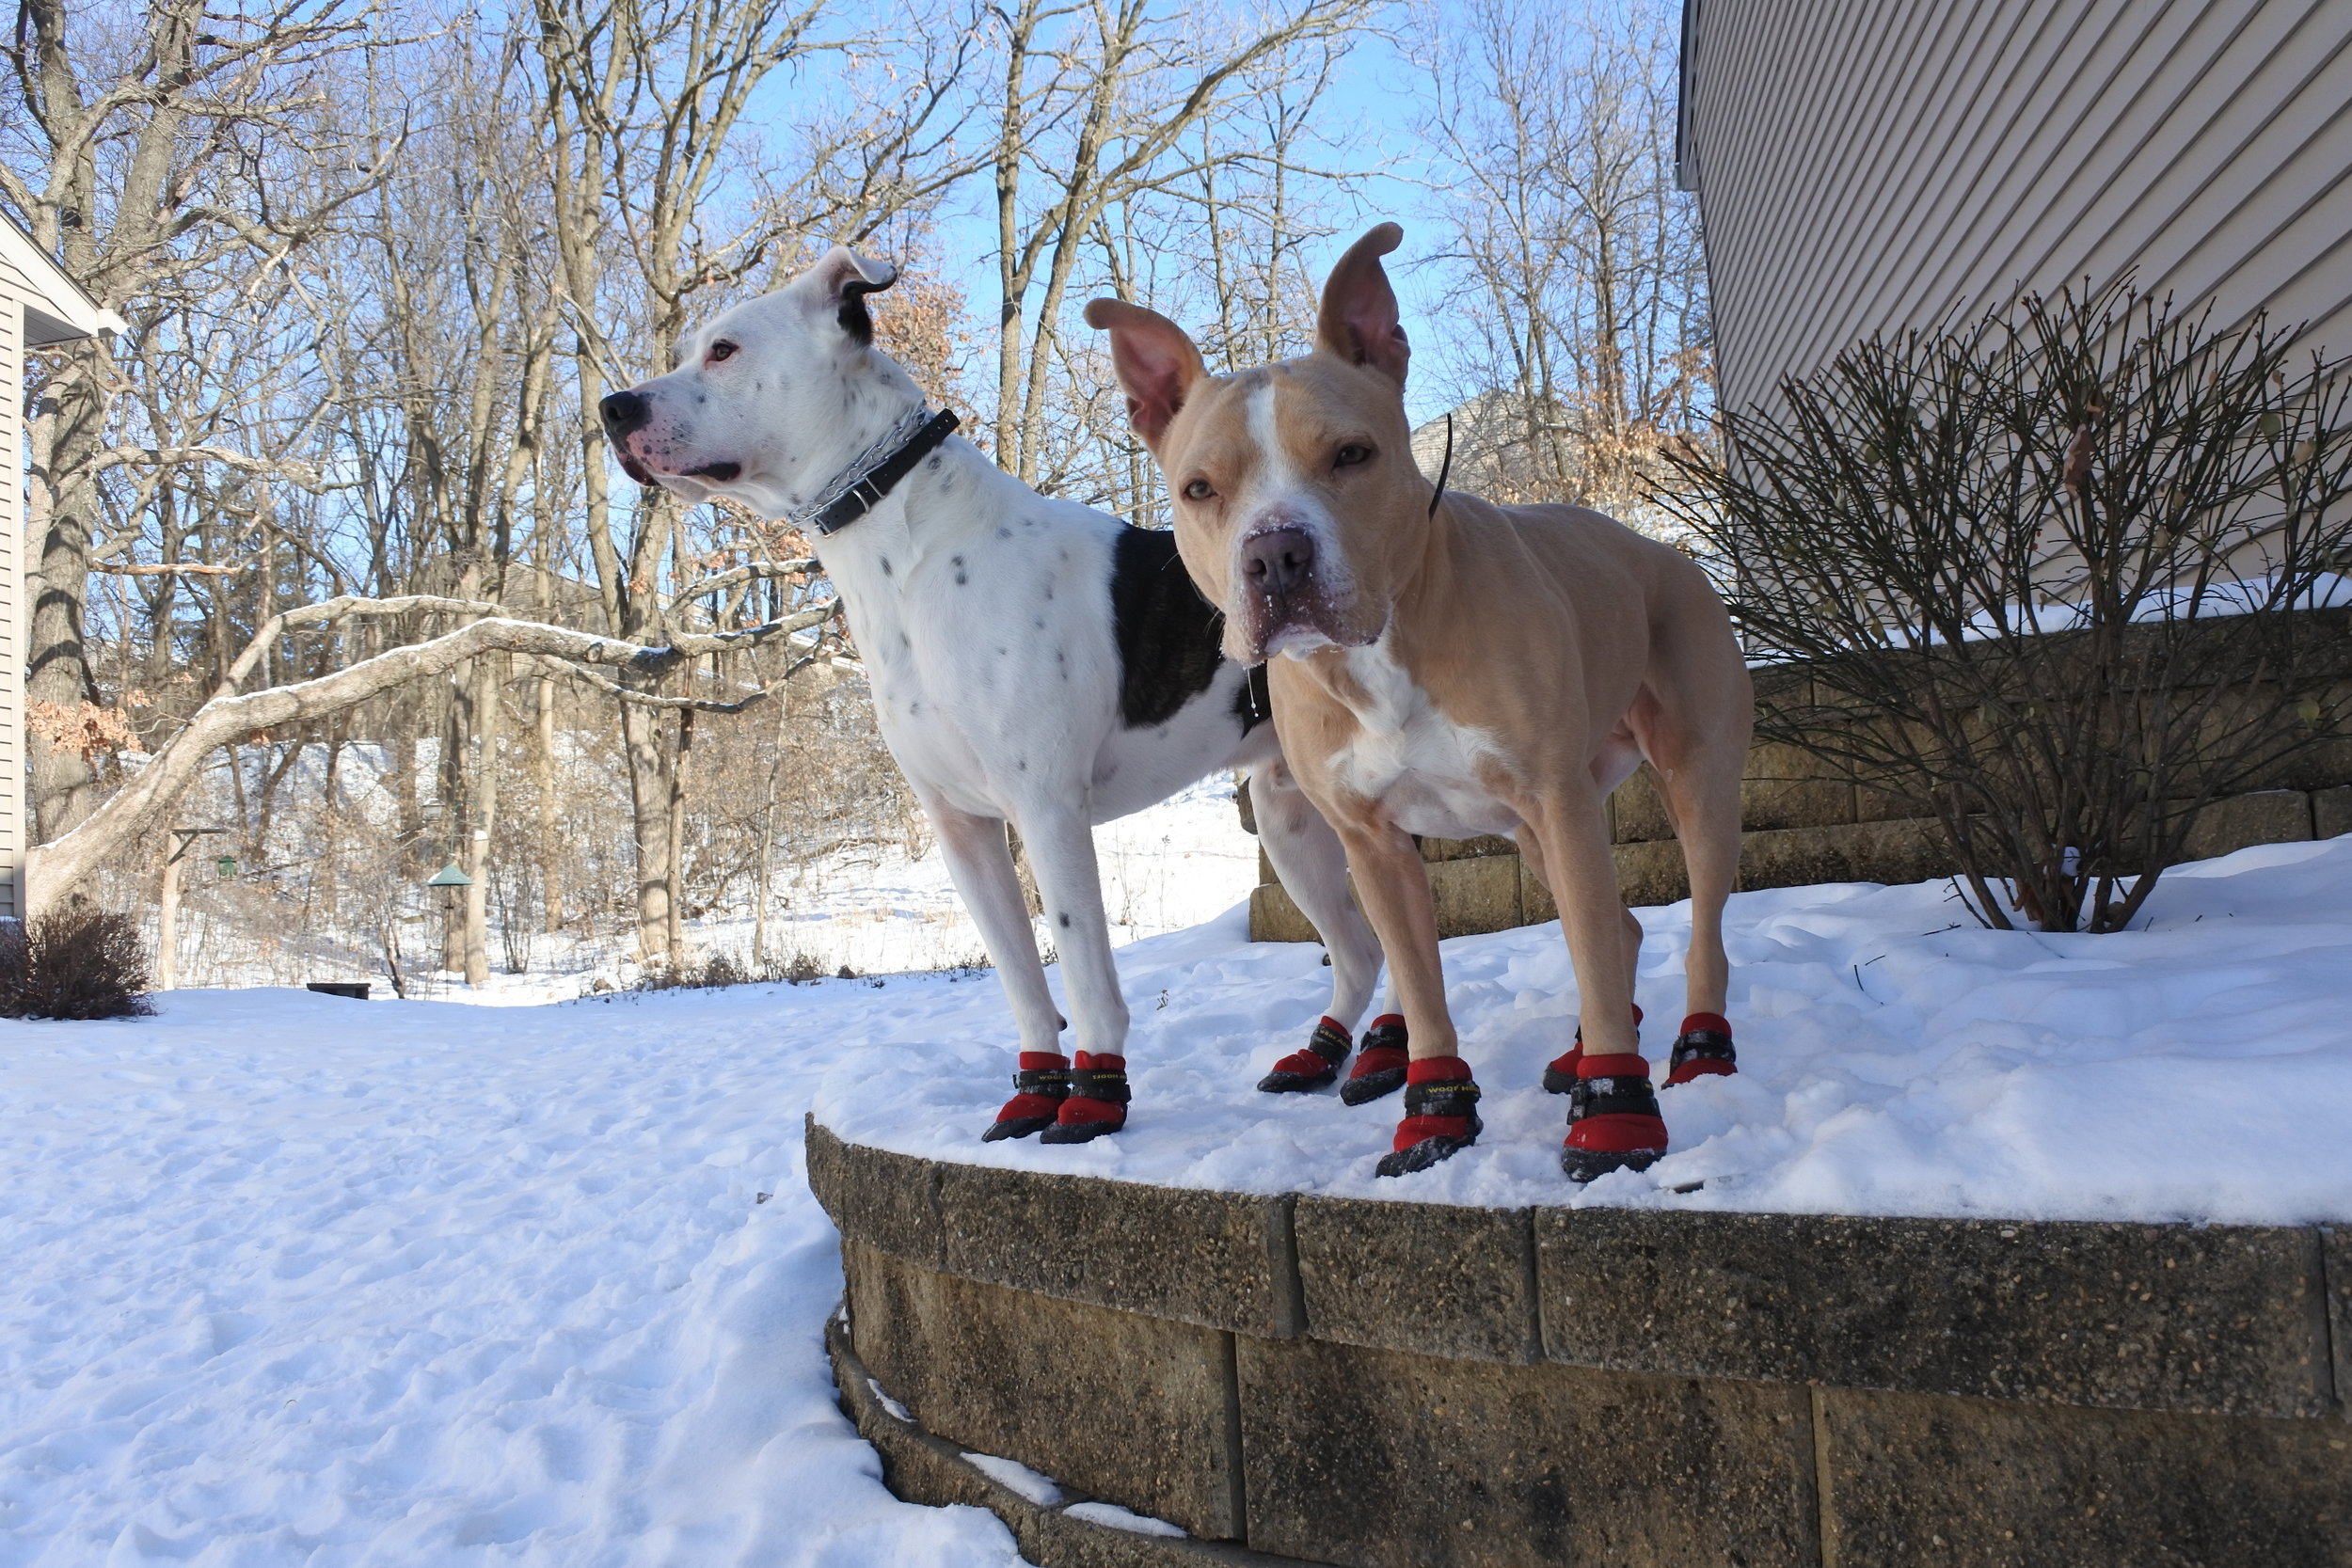 Dog to dog aggression - pit bull